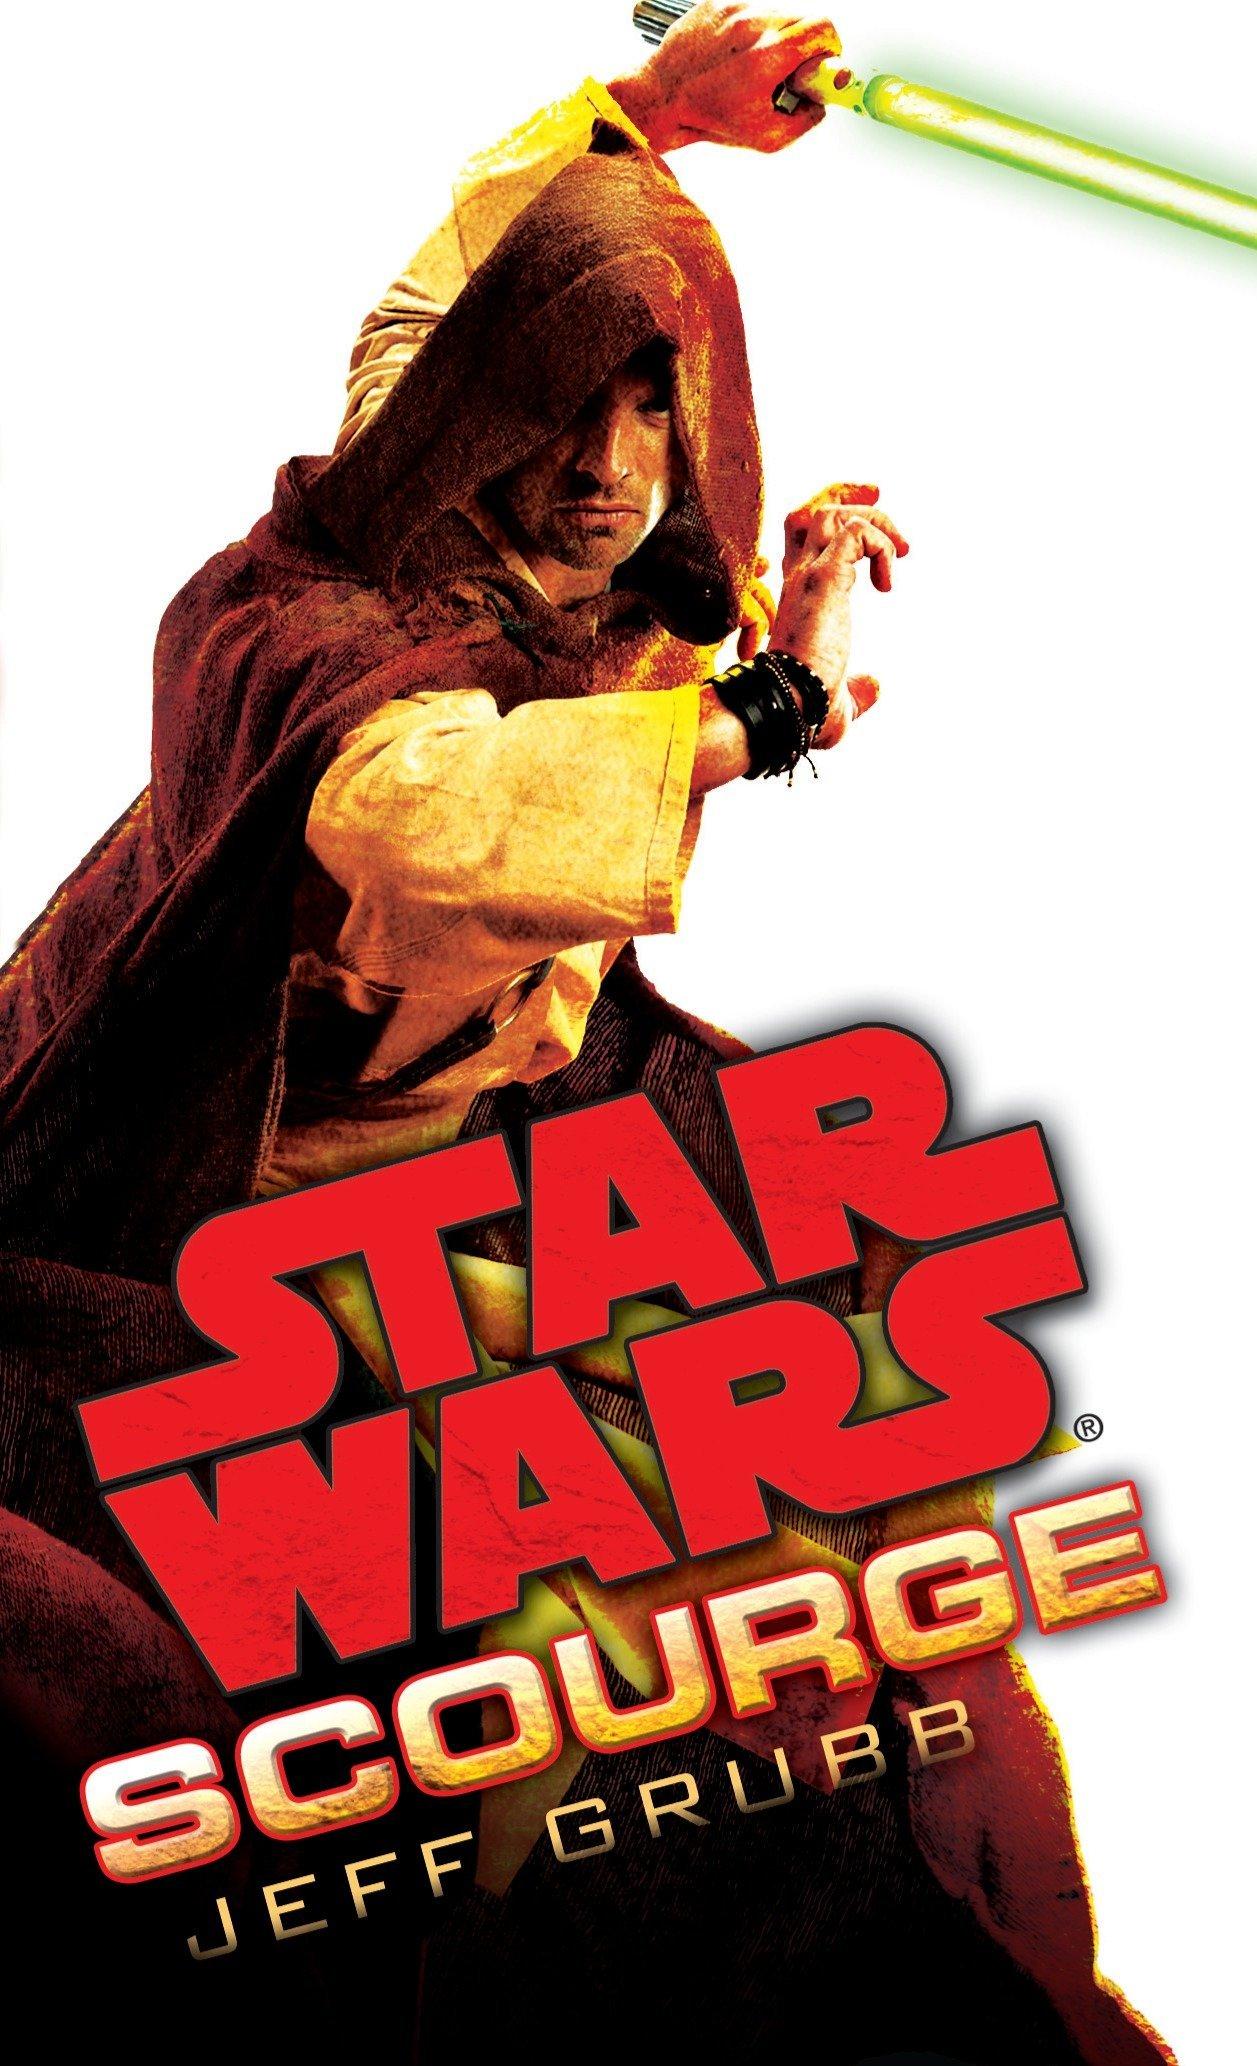 Star Wars: Scourge